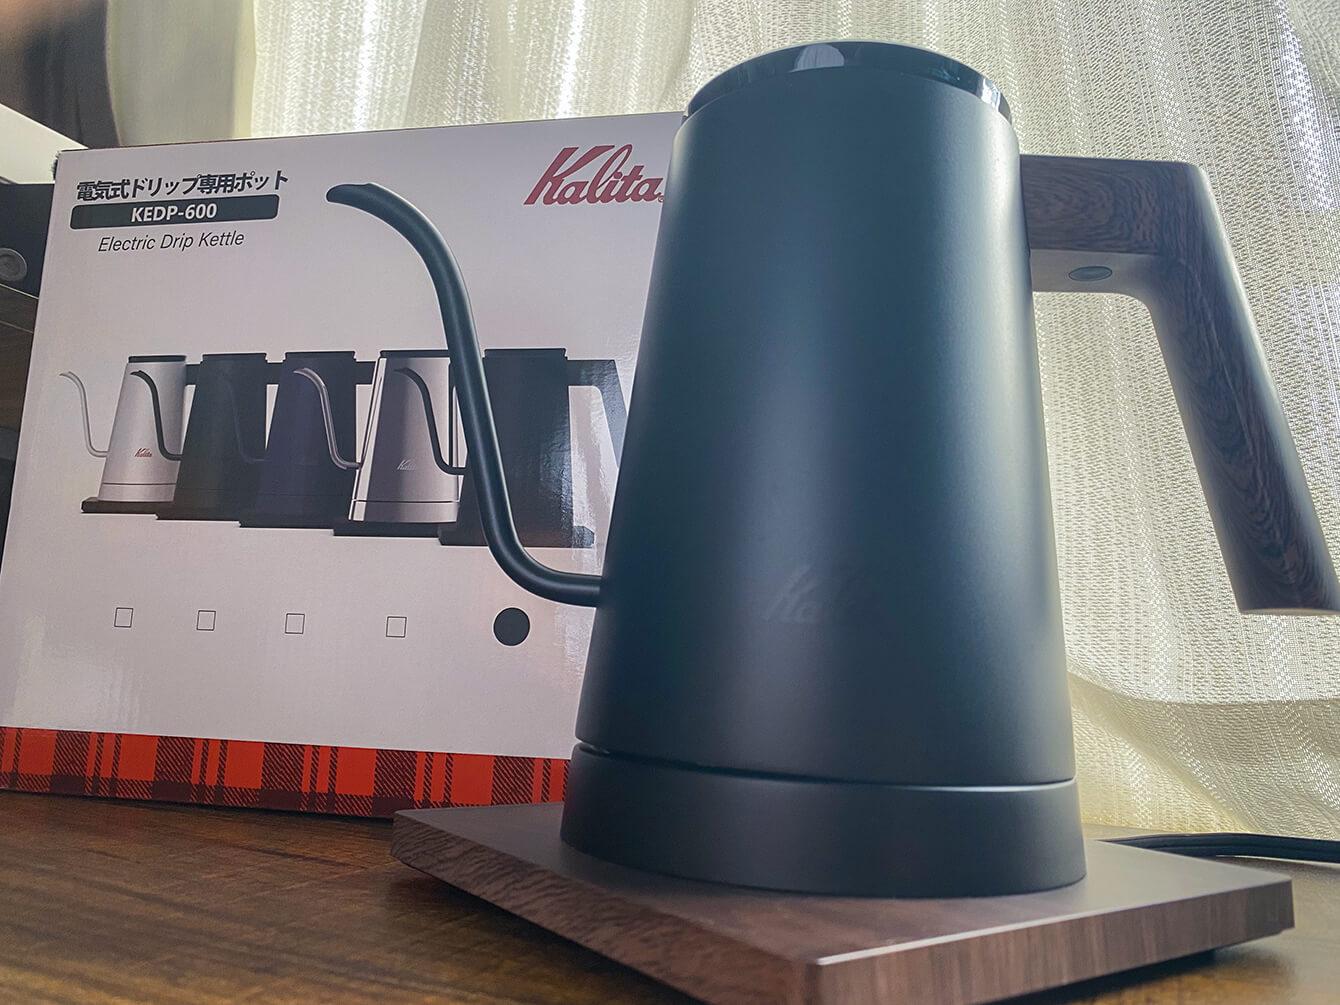 KalitaのKEDP-600の実機レビュー